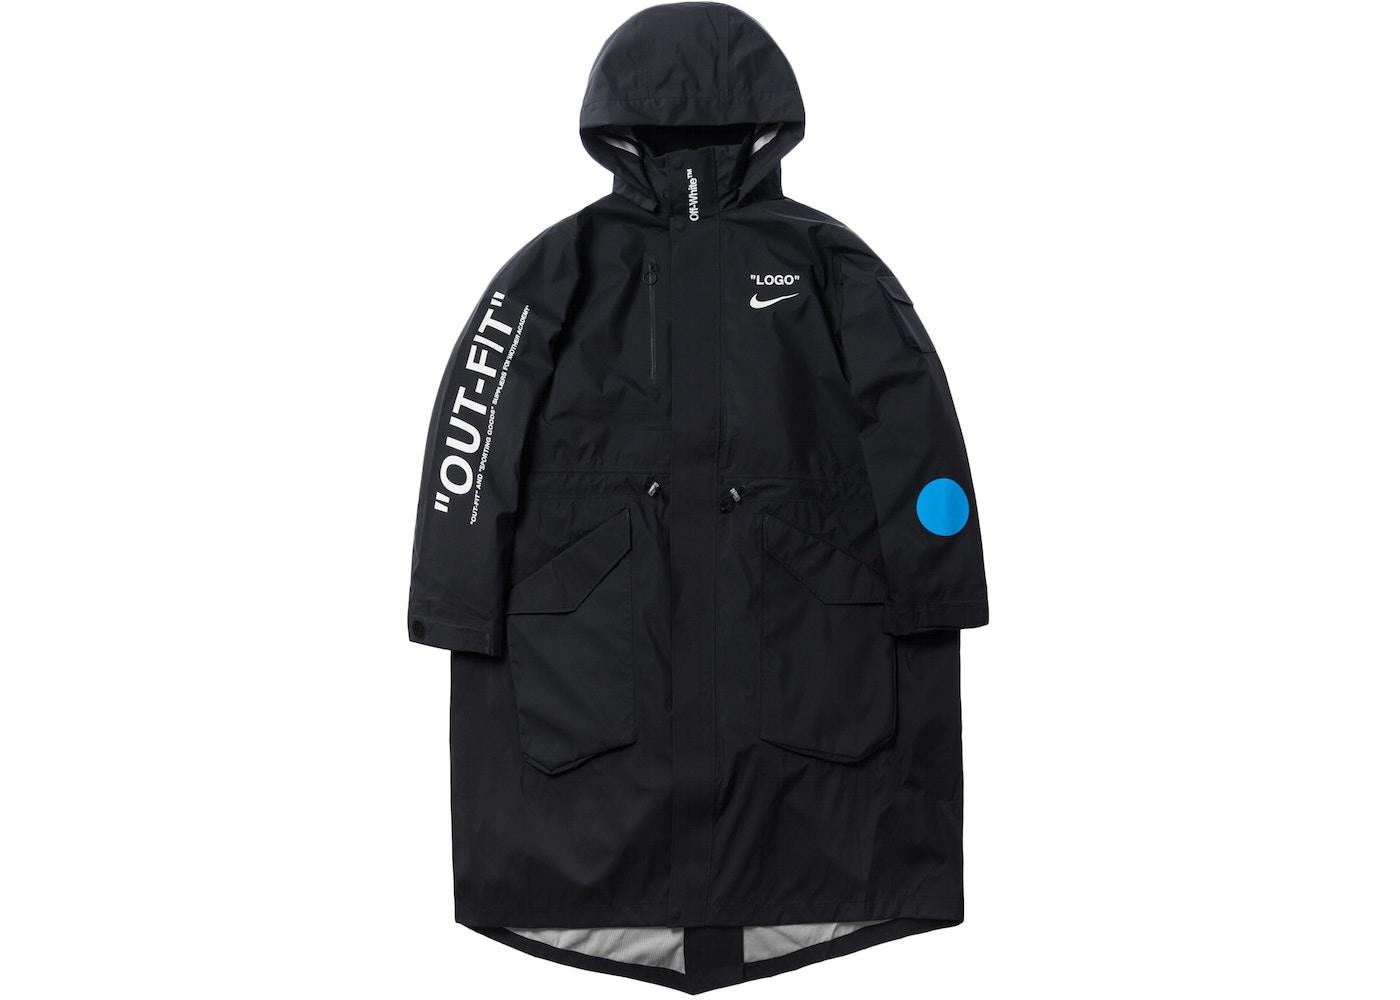 7b303a6dba65 Nikelab x OFF-WHITE Mercurial NRG X Jacket Jacket Black. Mercurial NRG X  Jacket